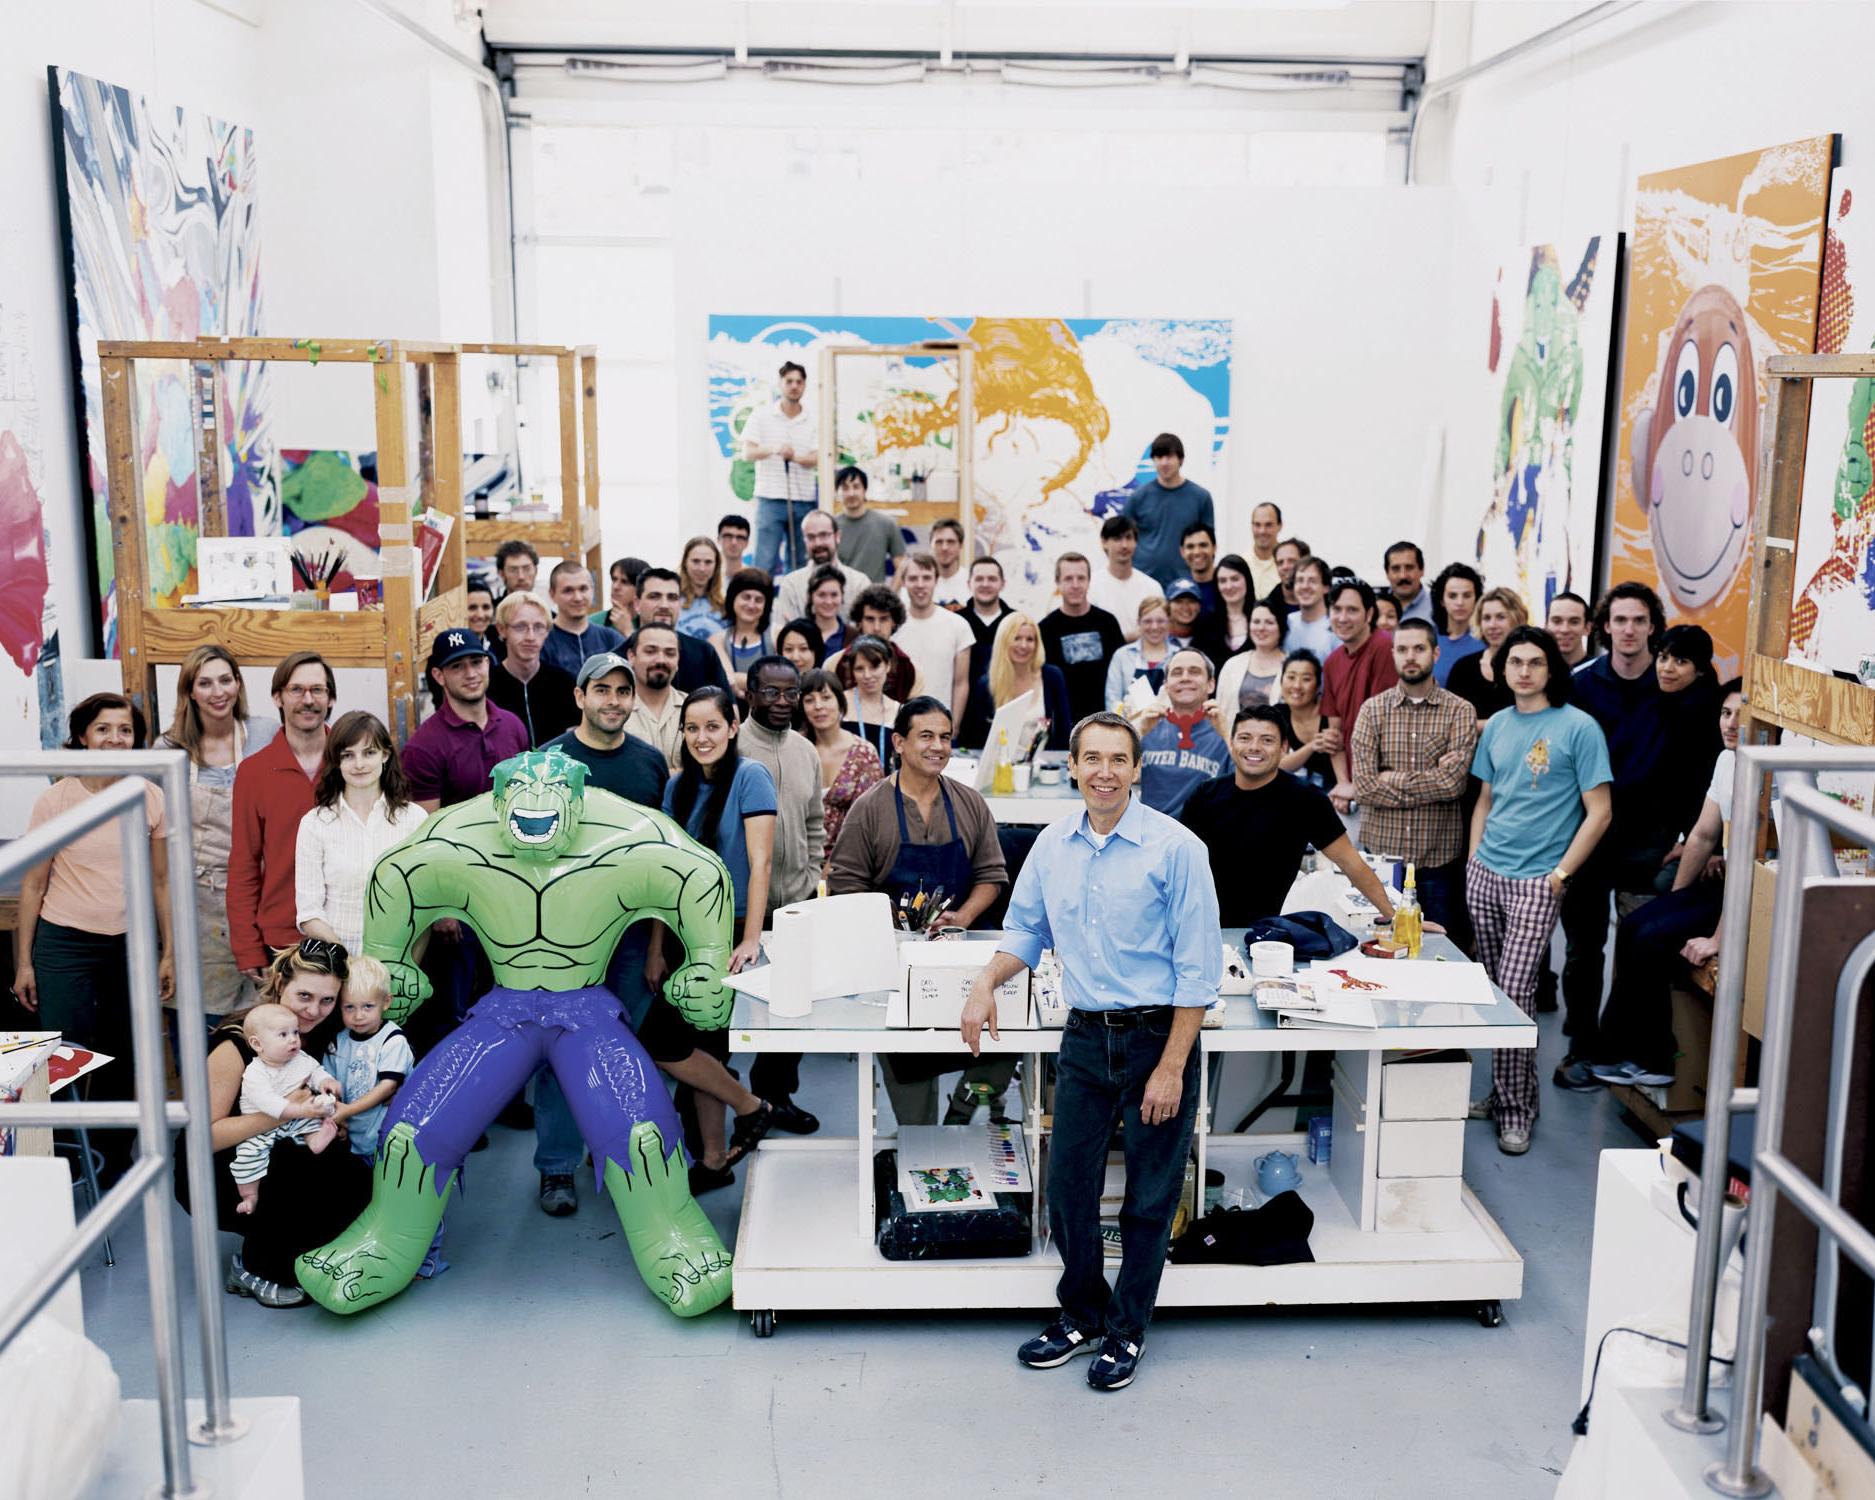 Jeff Koons, 2006 New York, New York